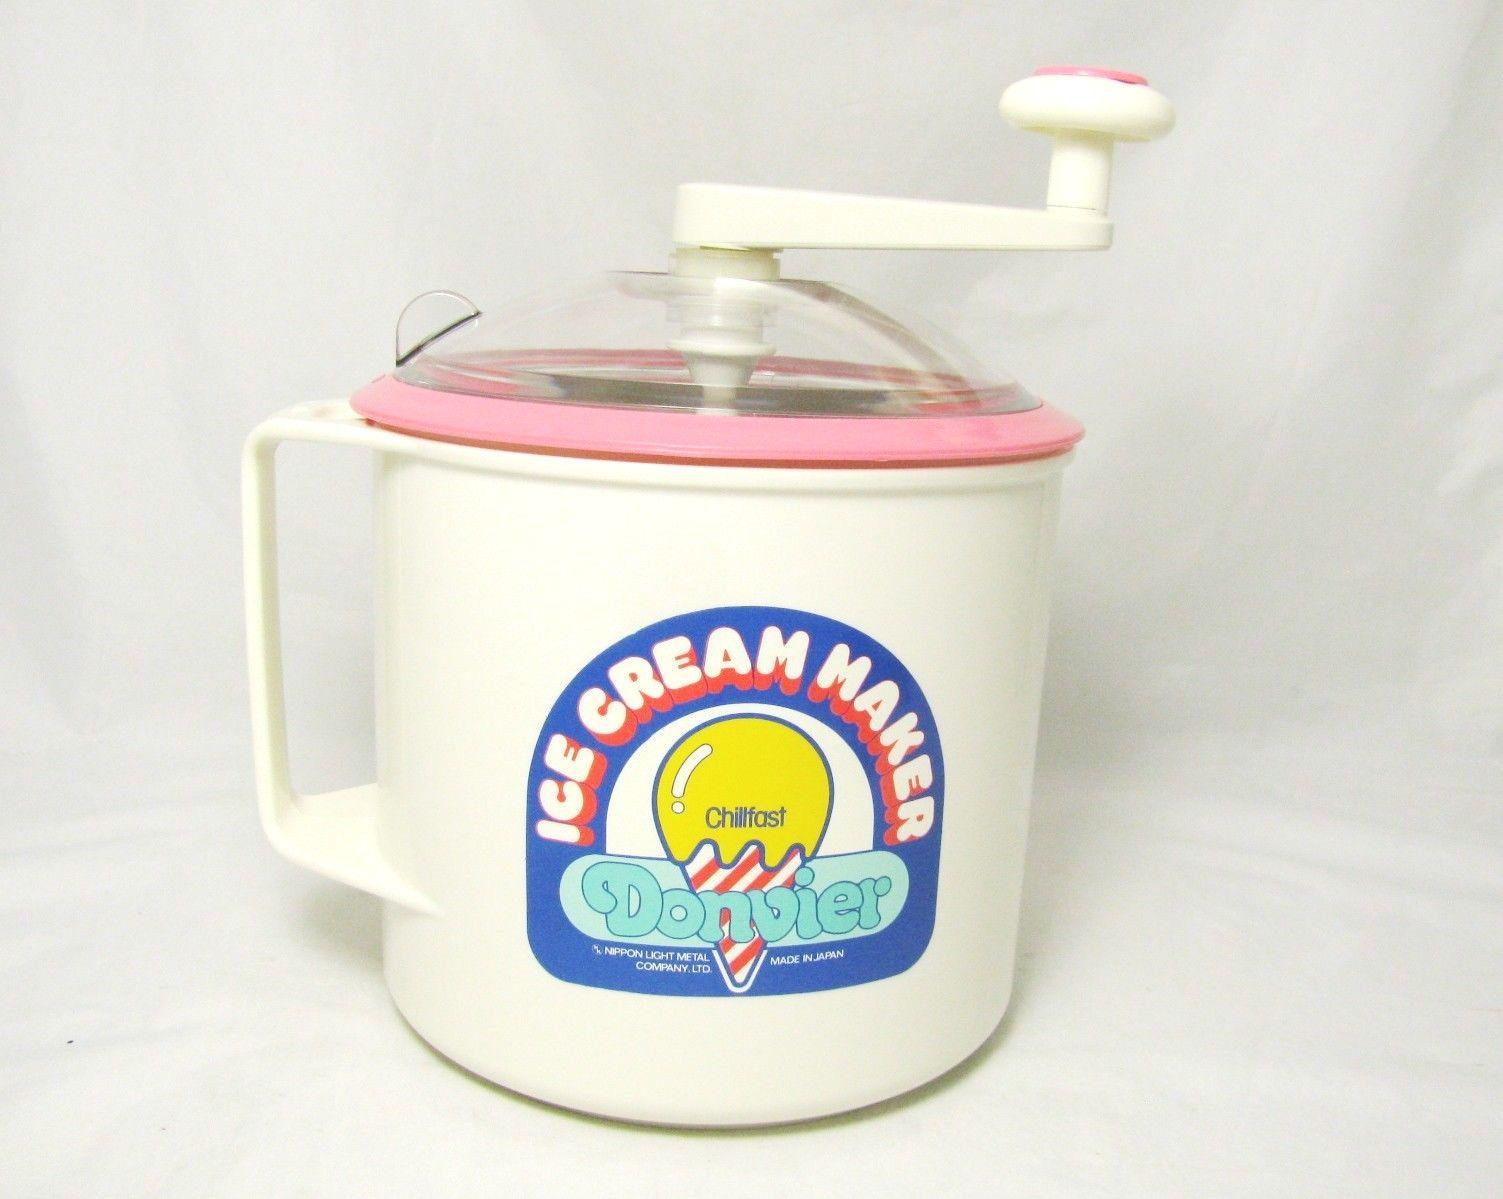 Donvier Ice Cream Maker Chillfast Hand Crank Pink White 1 Quart 2 Pints Japan #pinkrims